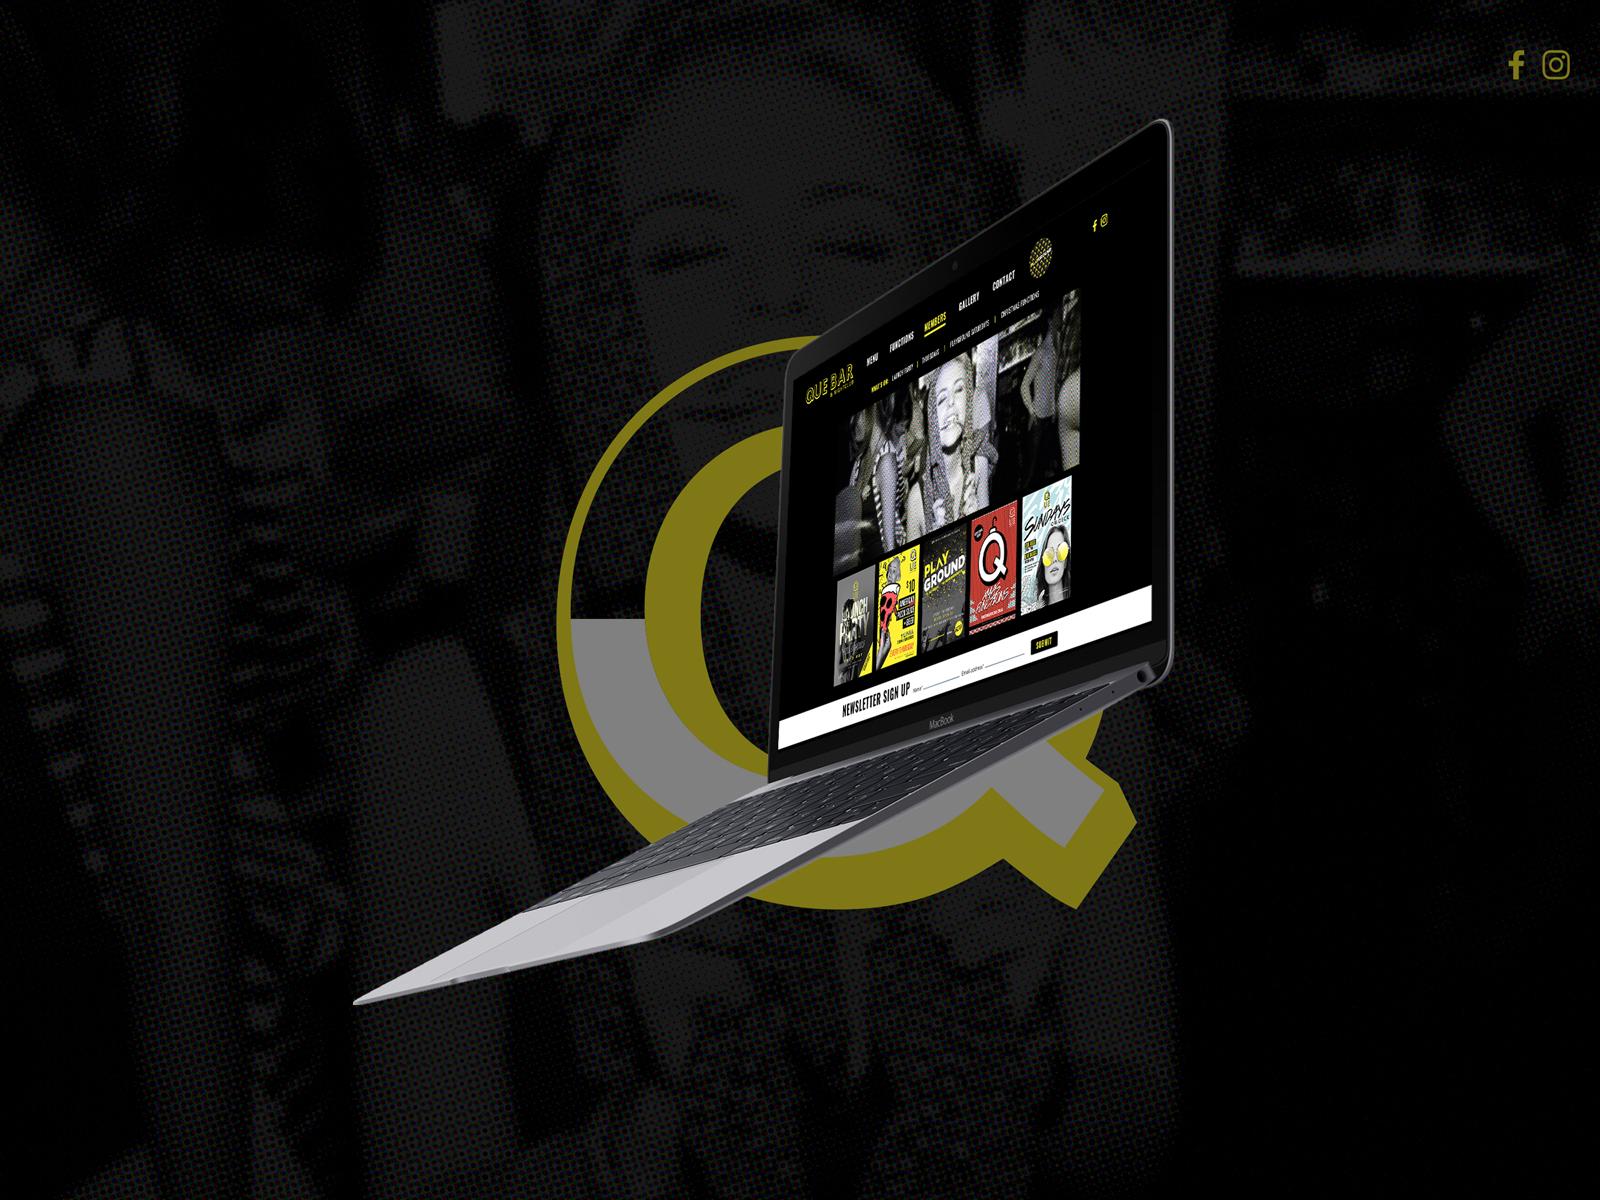 sydney-design-social-que-wagga-website-floating-laptop-homescreen